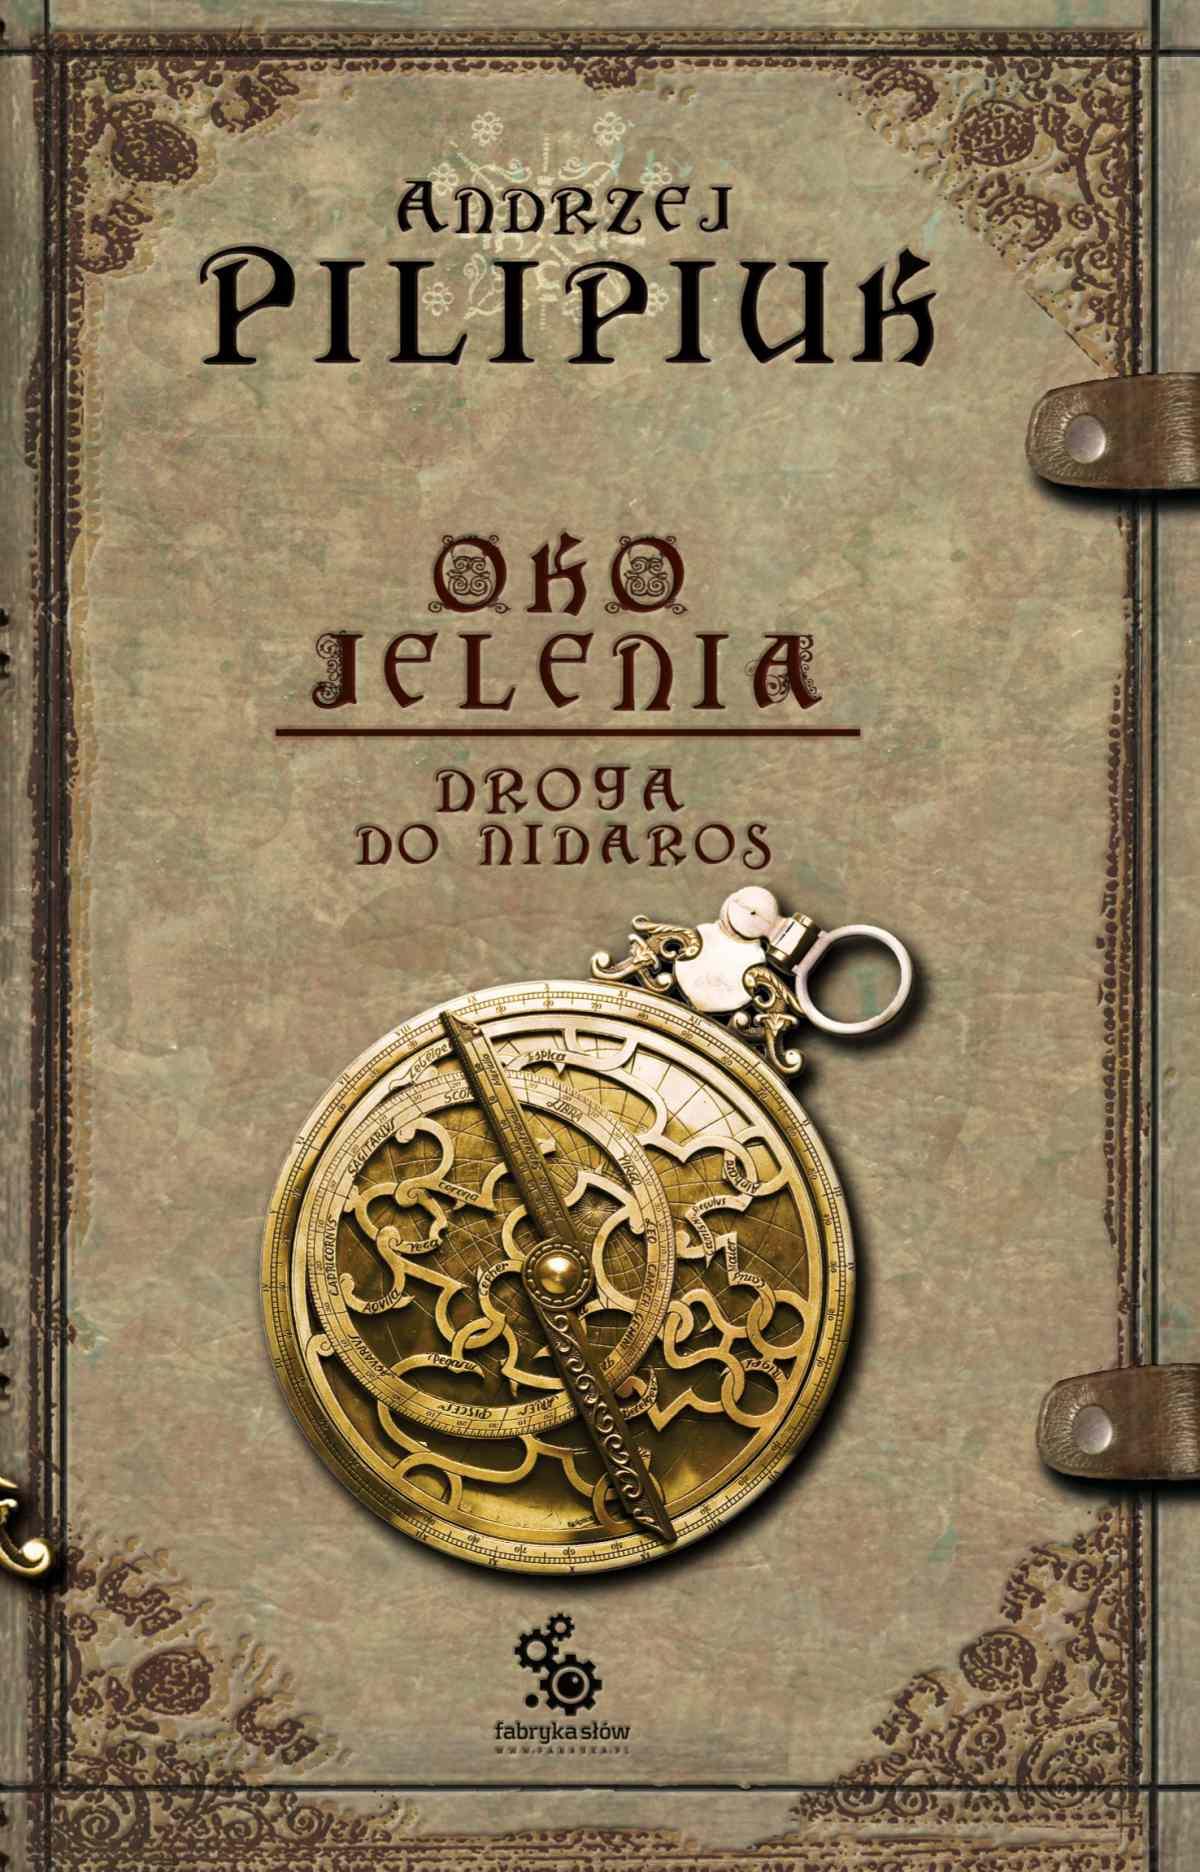 Oko Jelenia. Droga do Nidaros - Ebook (Książka na Kindle) do pobrania w formacie MOBI